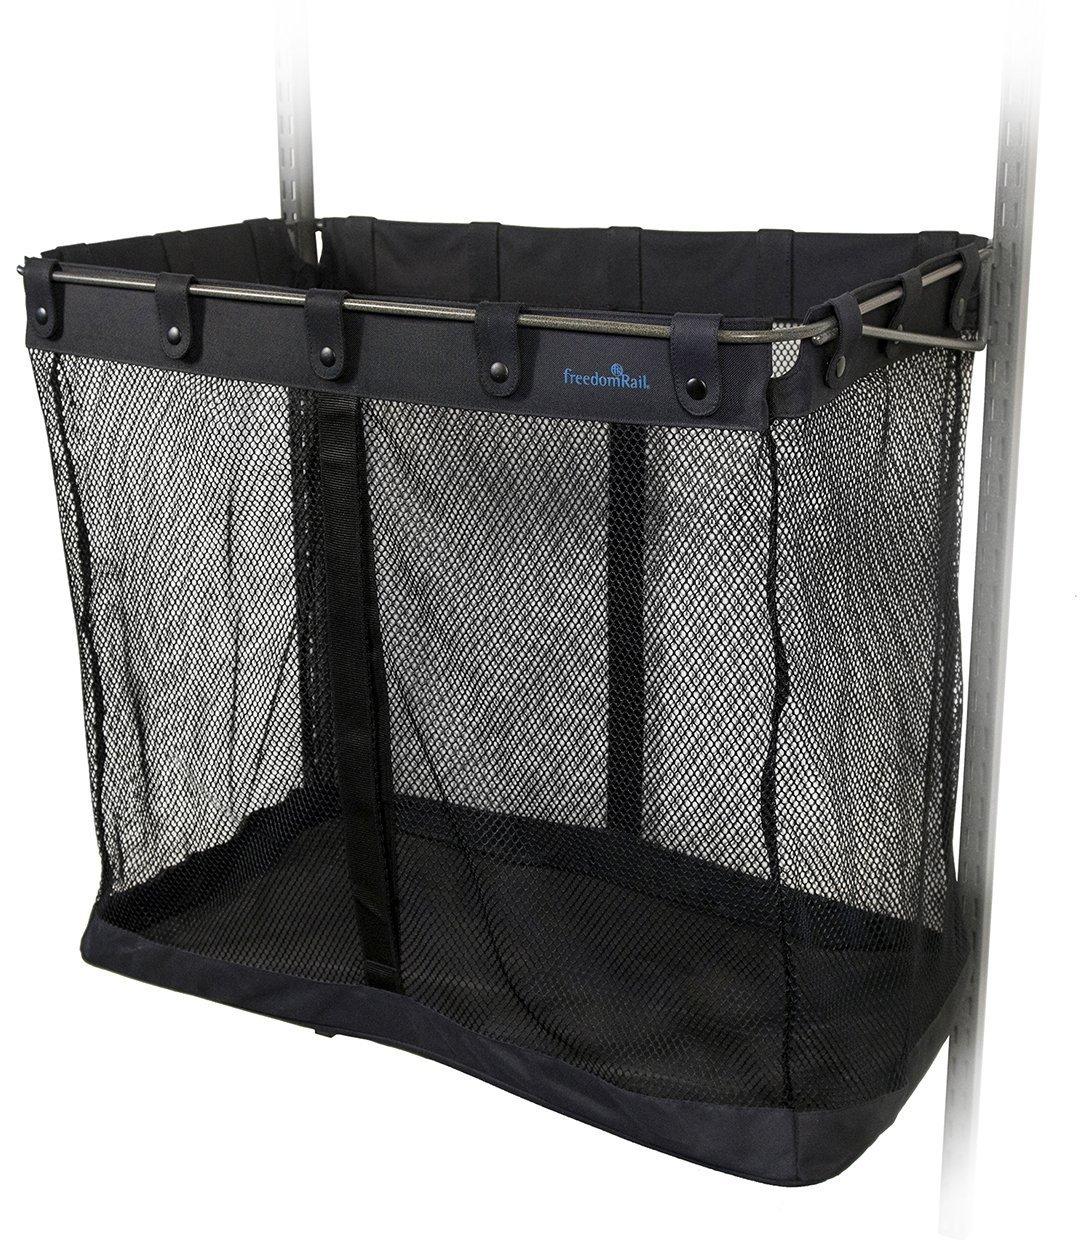 K&A Company freedomRail Garage Big Mesh Sports Basket, 26'' x 16'' x 15 lbs